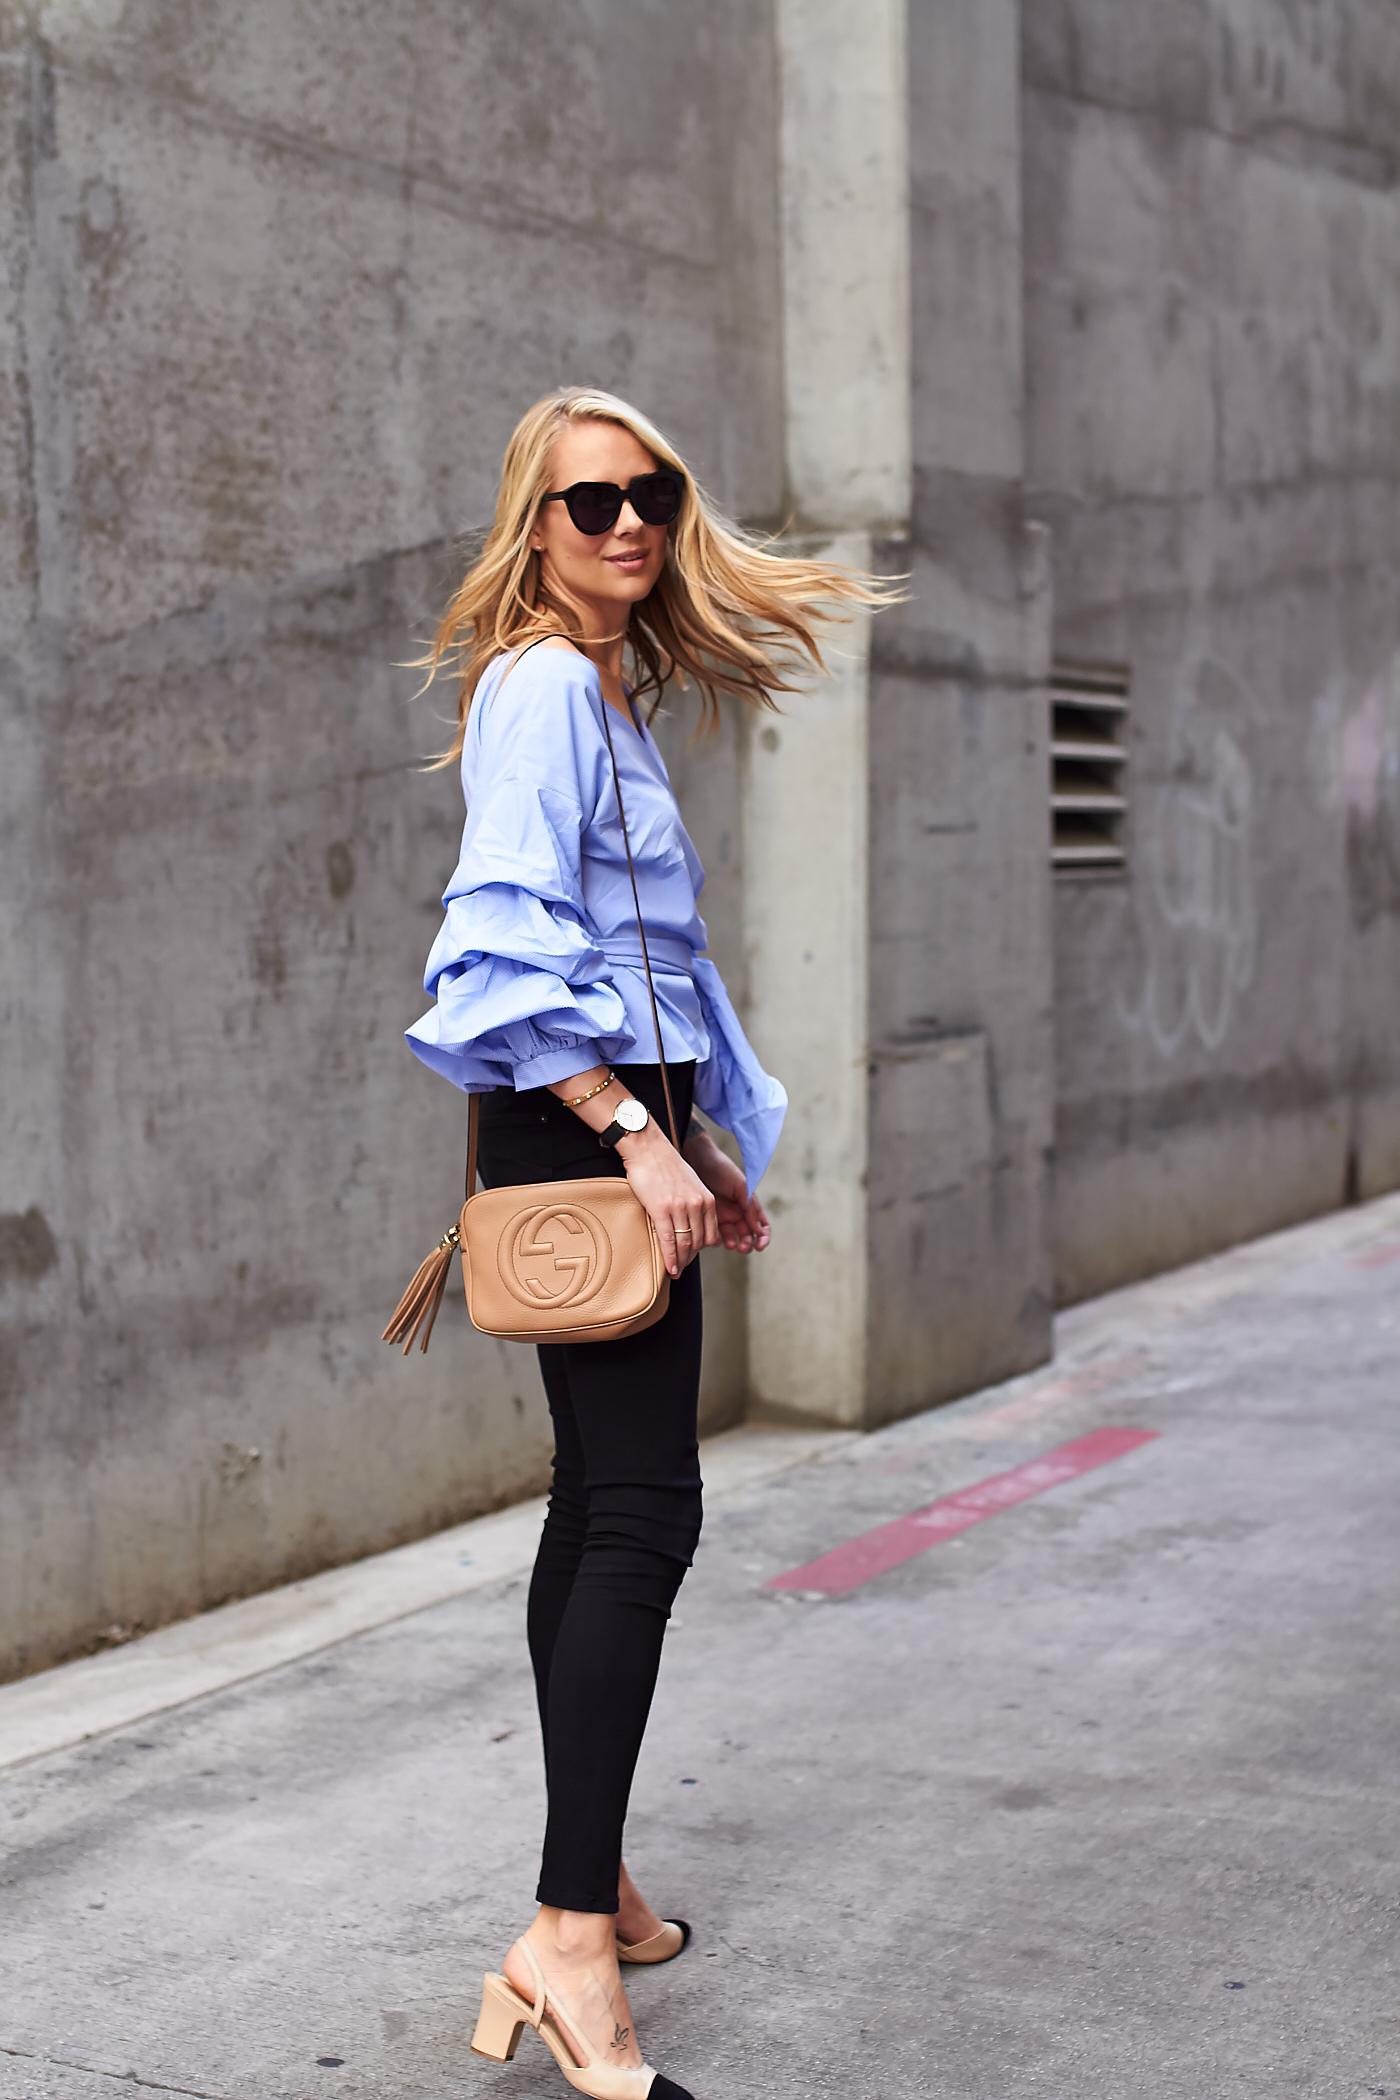 fashion-jackson-gucci-soho-handbag-blue-ruffle-sleeve-wrap-blouse-black-skinny-jeans-james-jeans